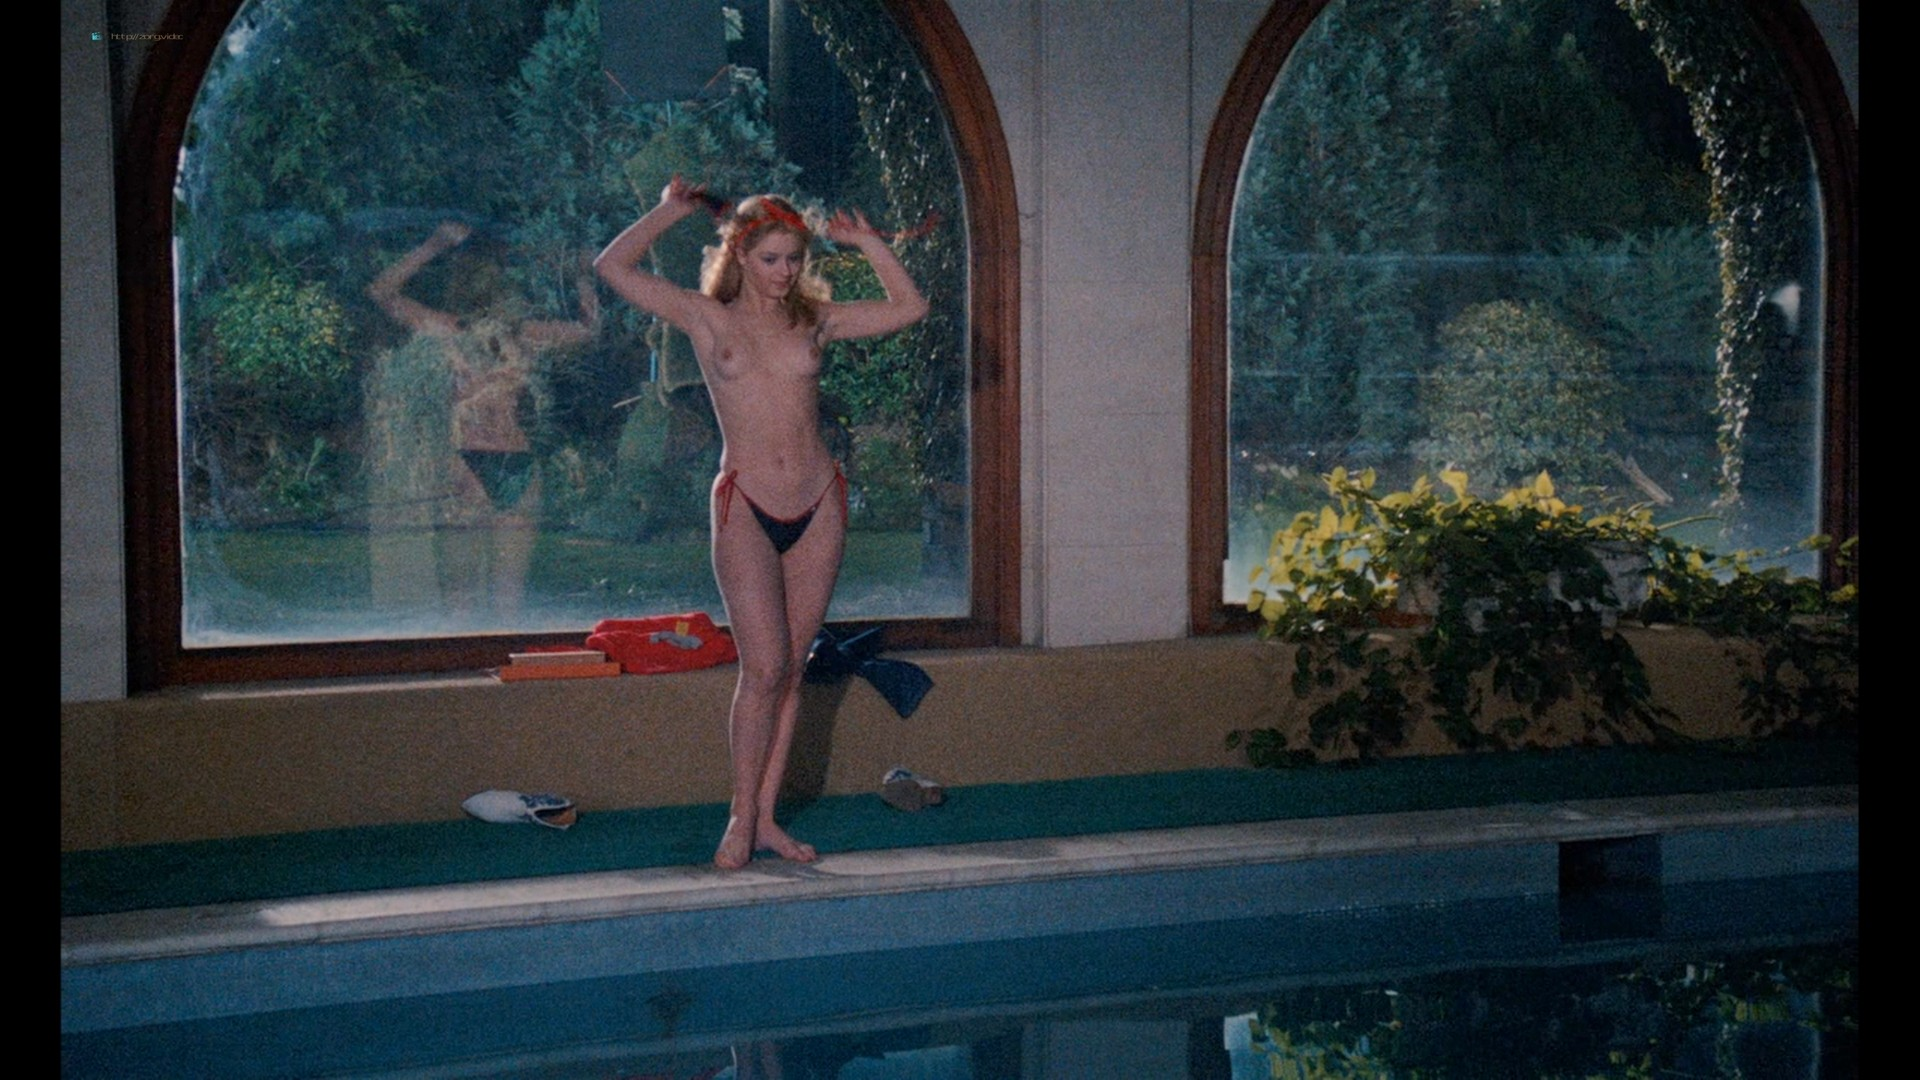 Roxana Nieto nude Leticia Marfil and Pilar Alcón all nude bush topless - Pieces (1982) HD 1080p BluRay (19)